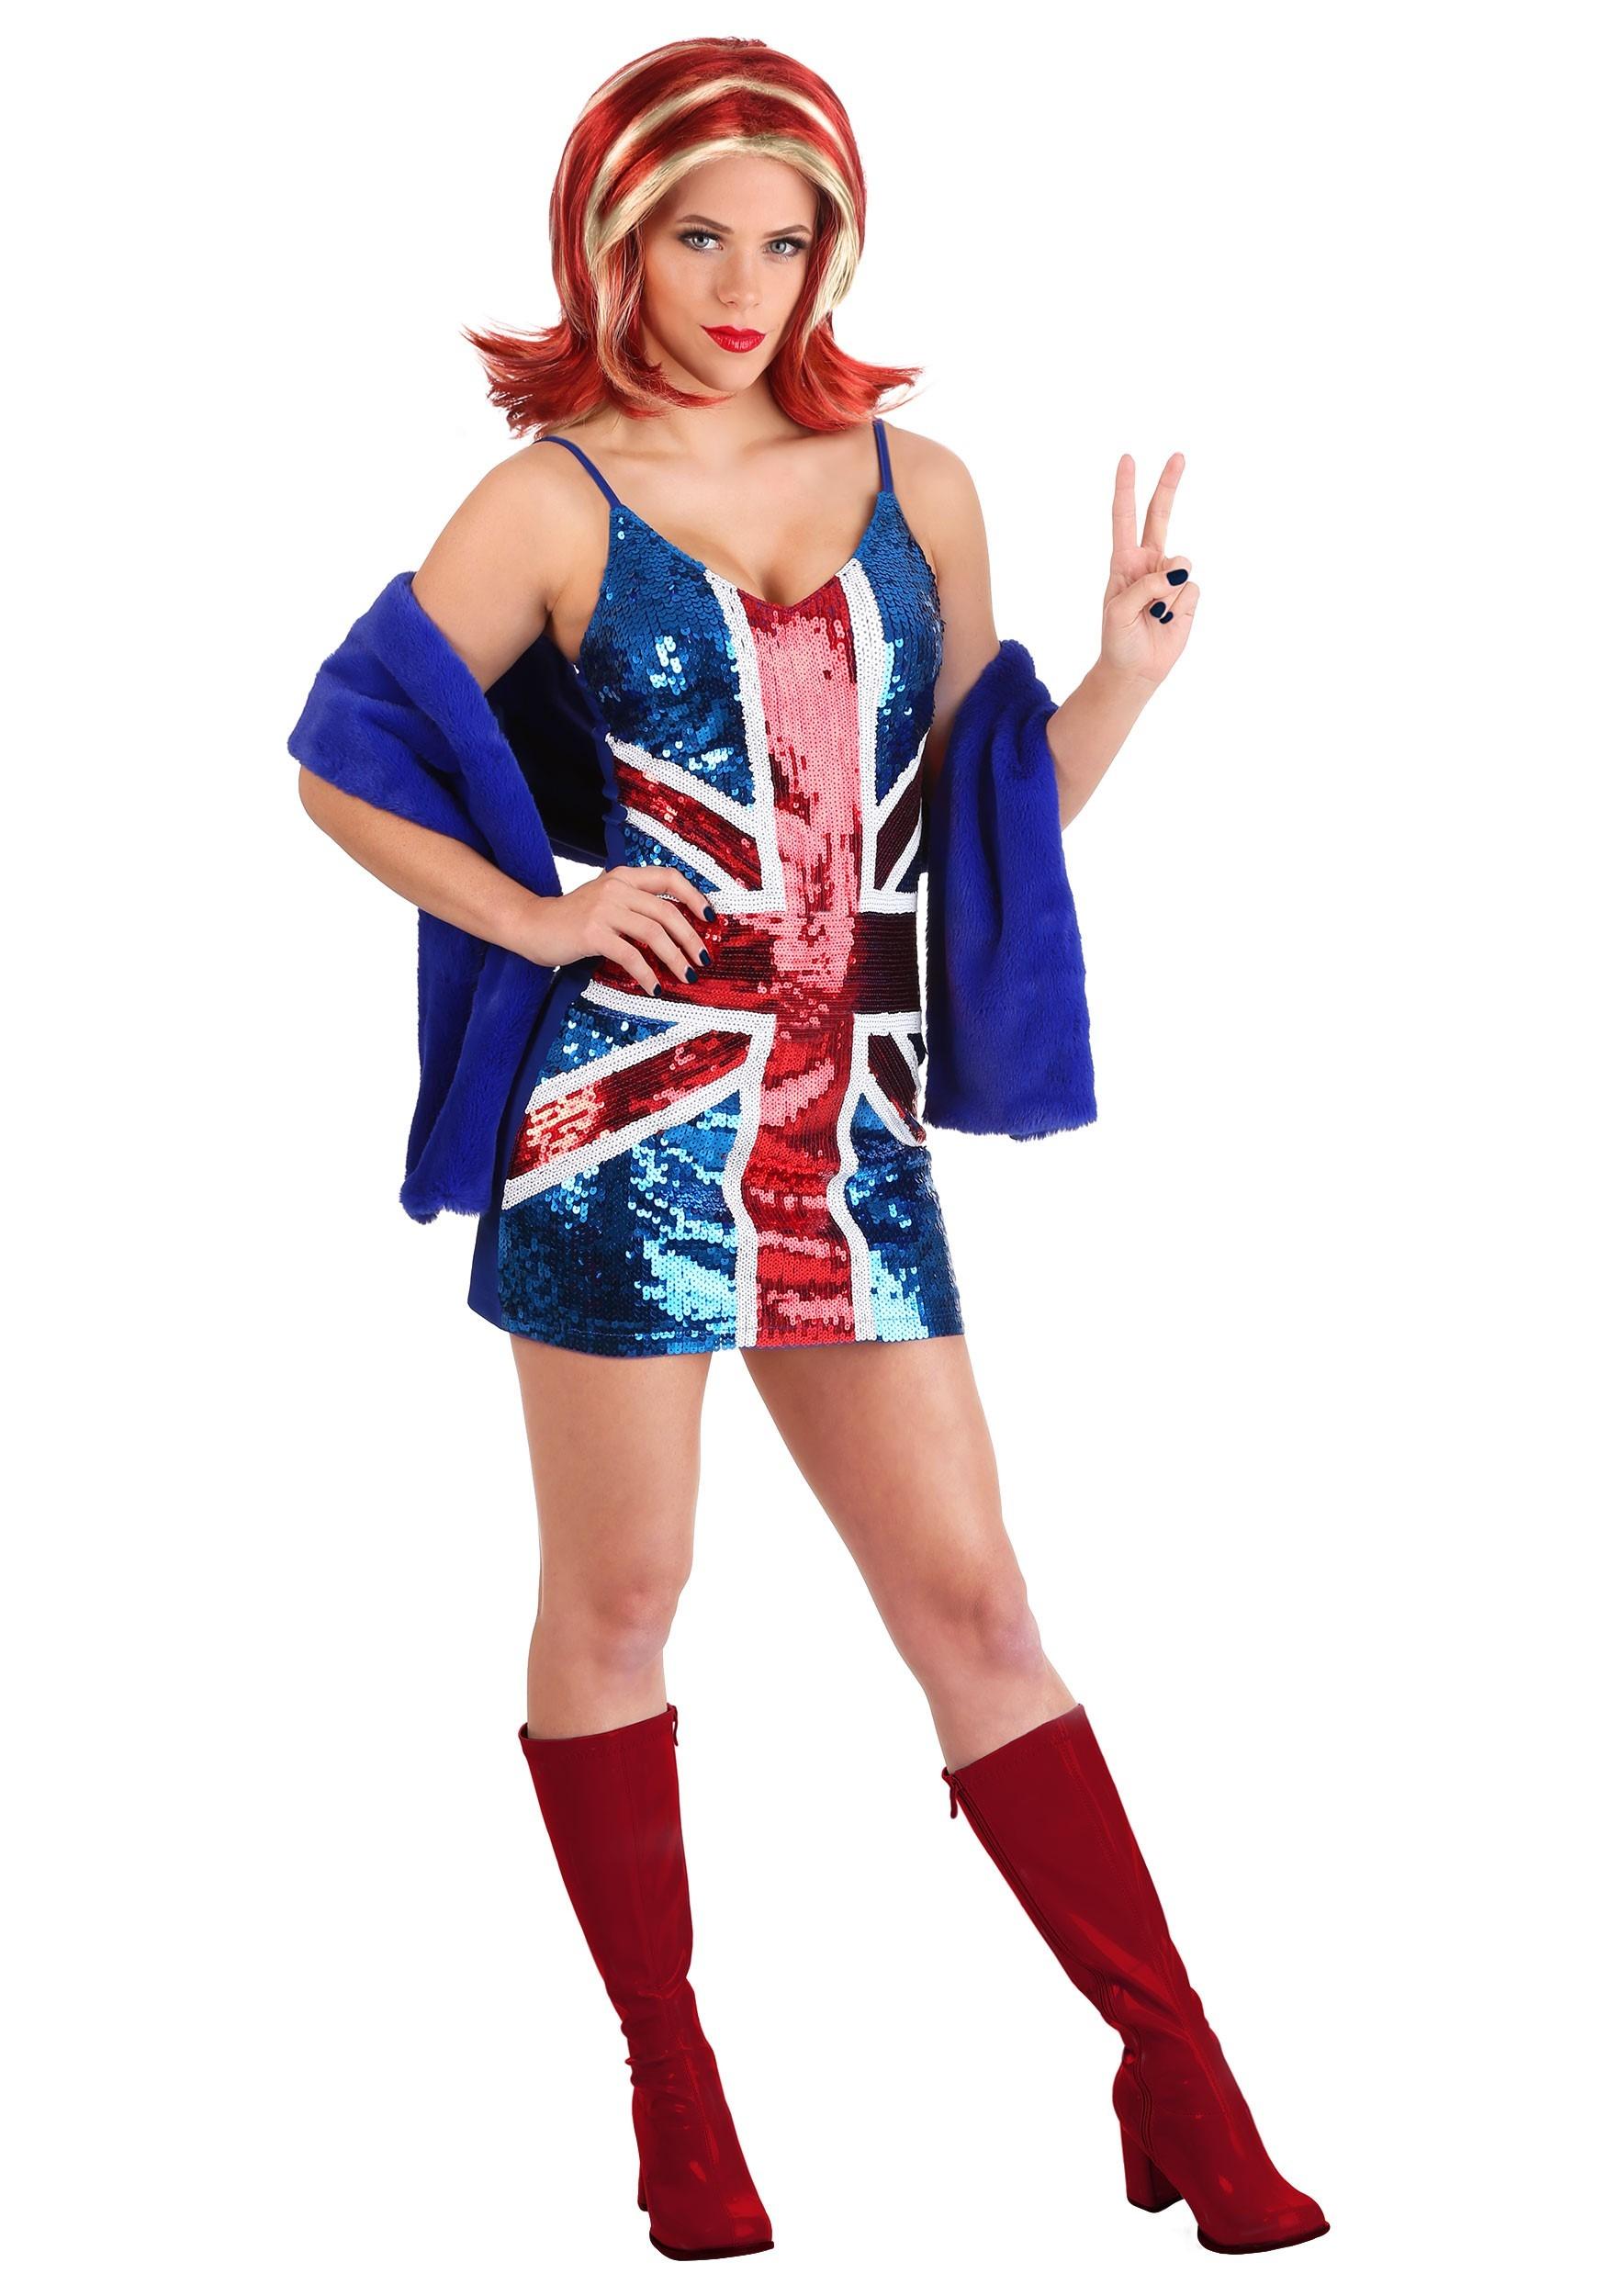 Ginger Spice Halloween Costume